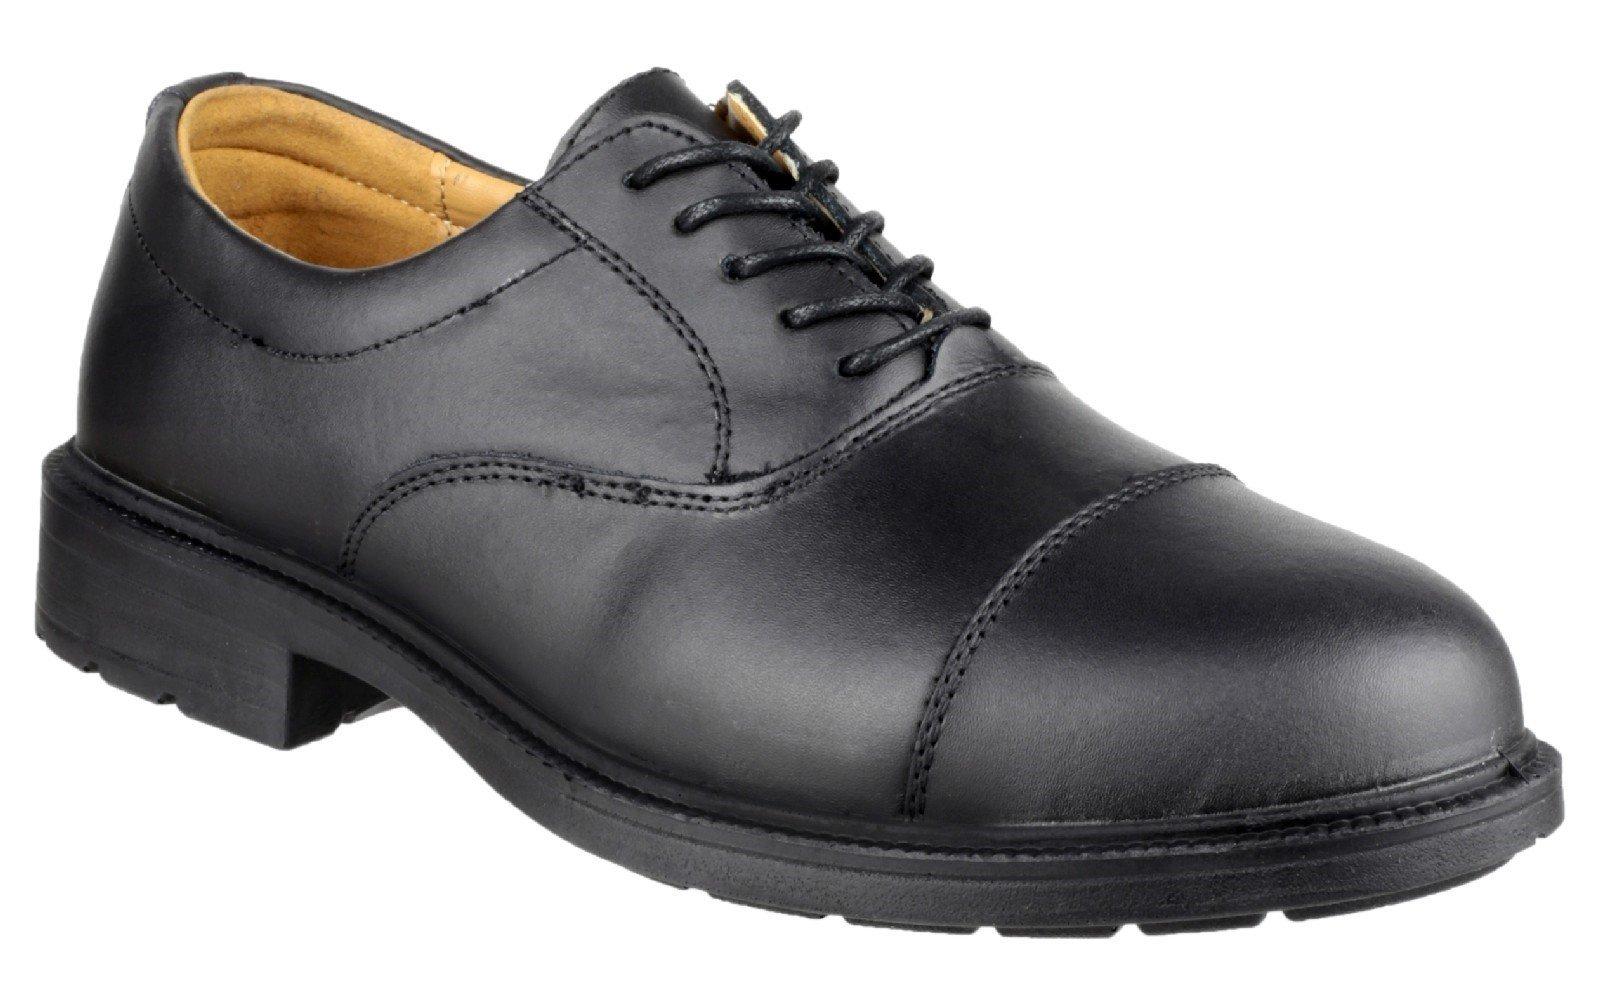 Amblers Men's Safety Work Oxford Shoe Black 25277 - Black 13